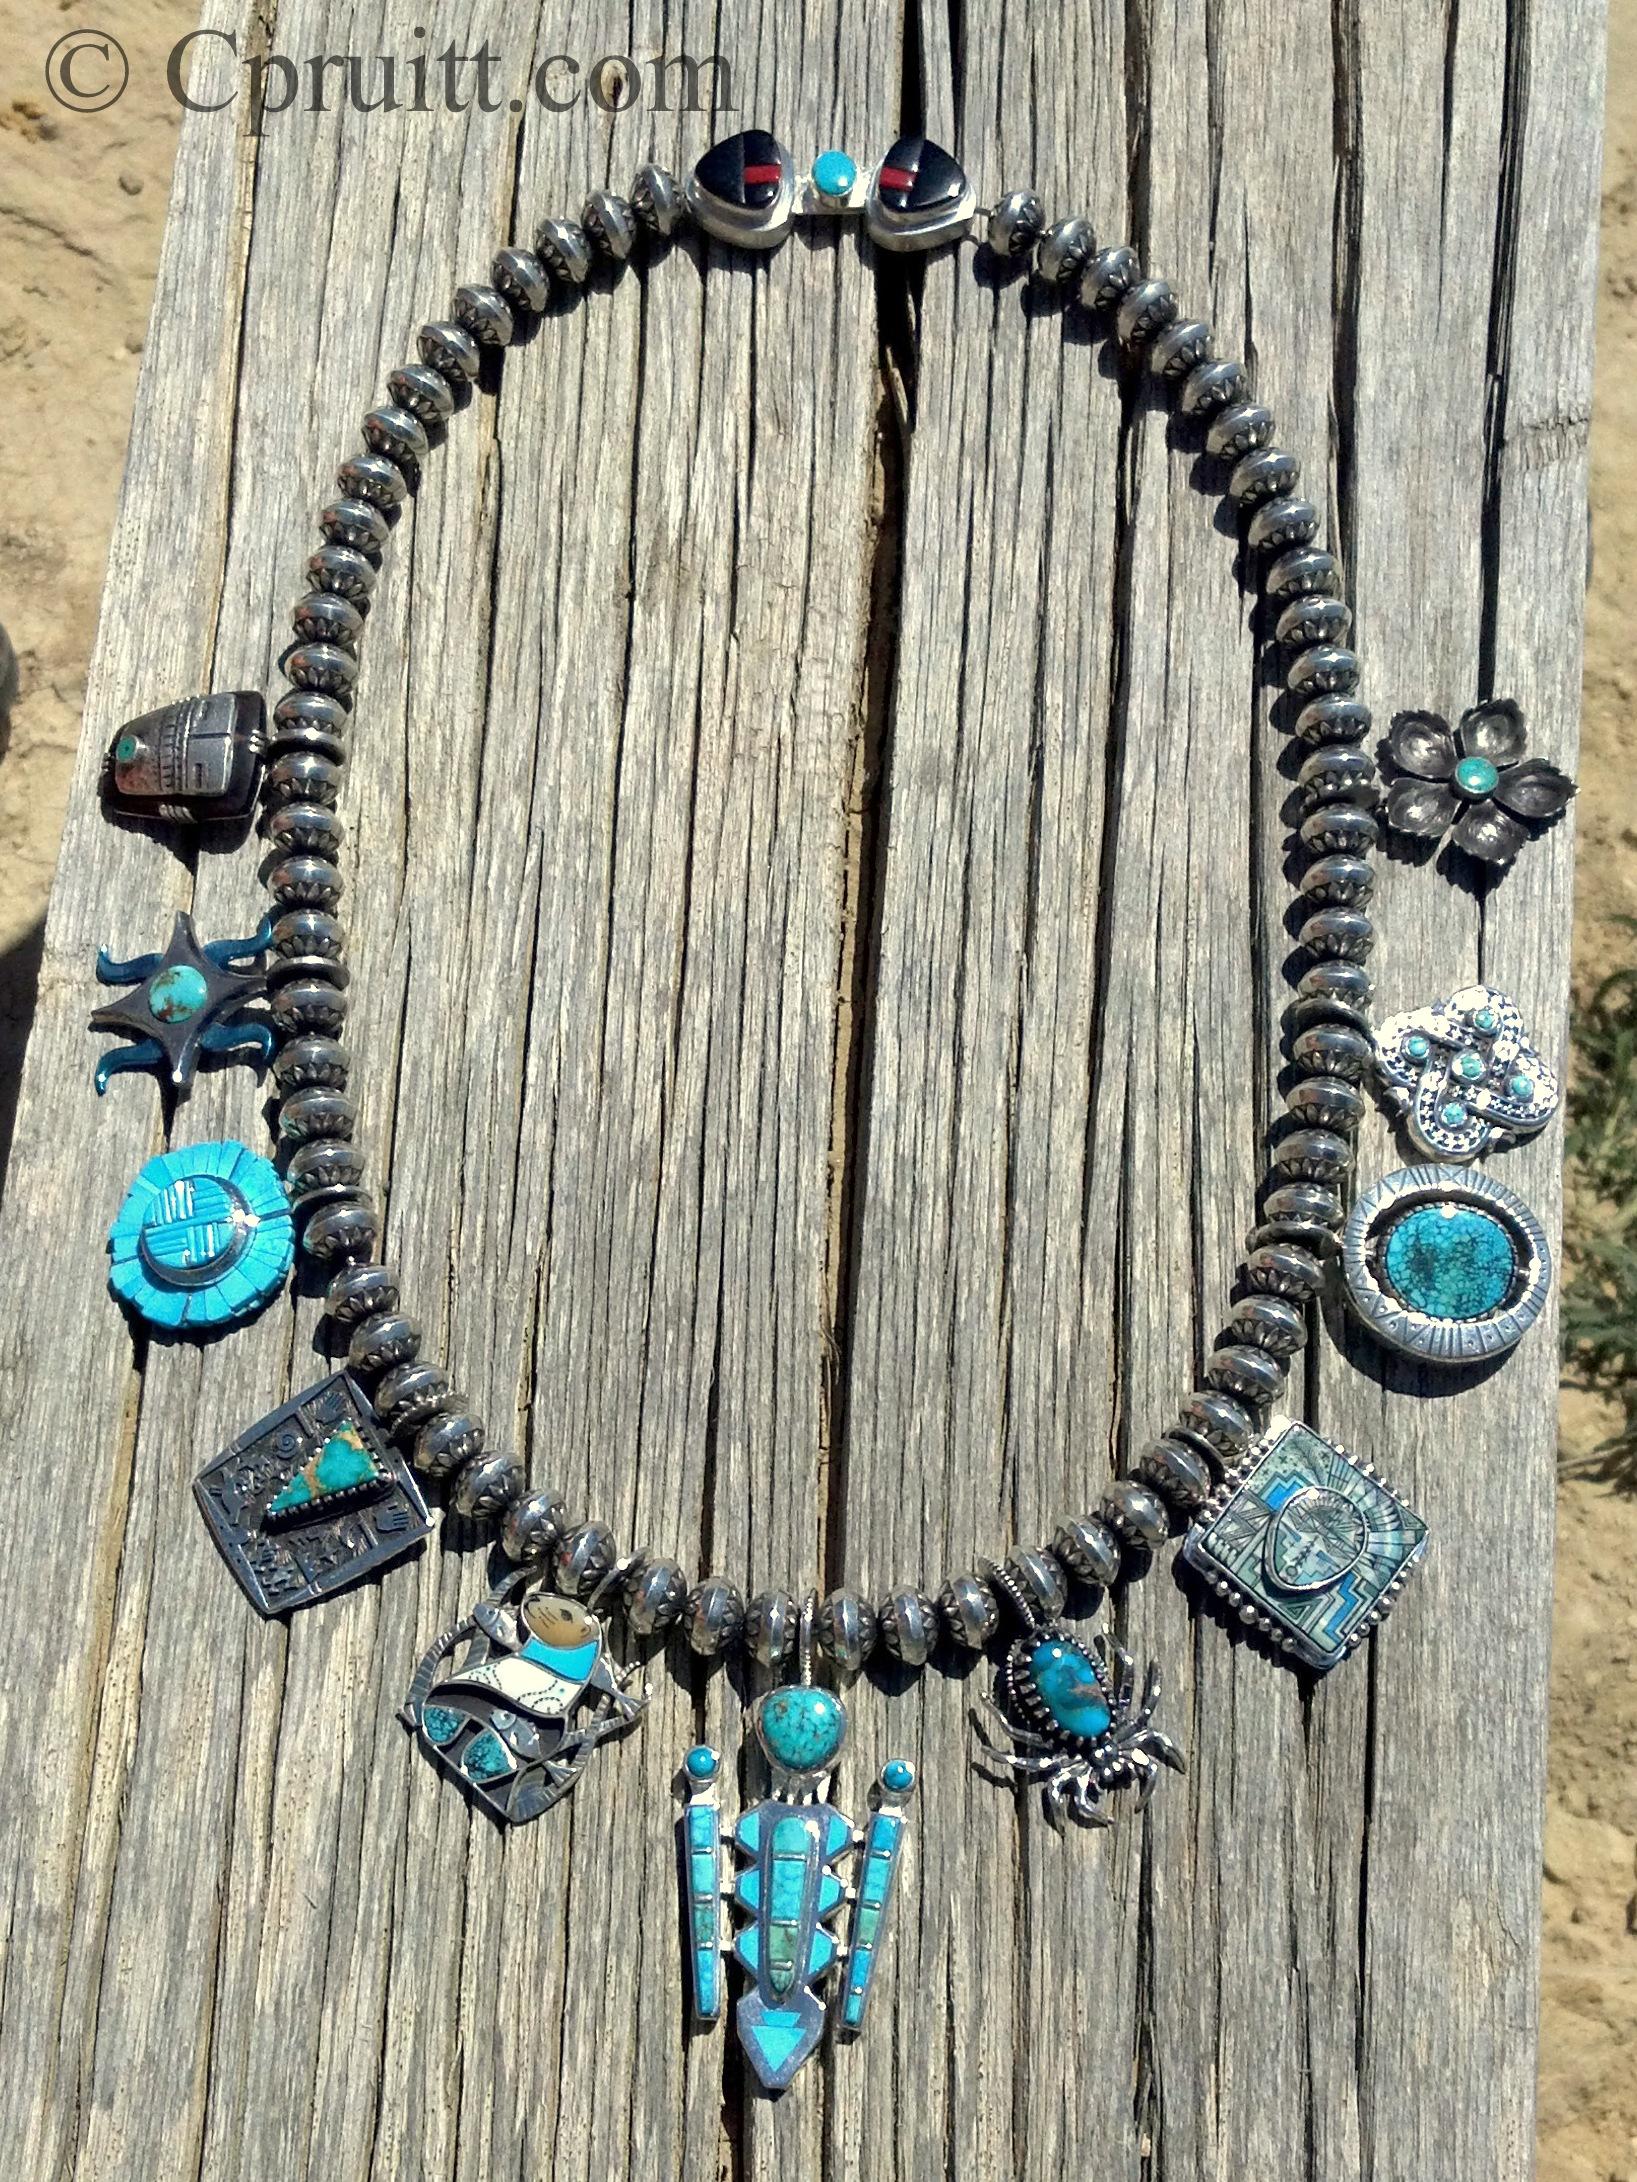 Friendship Necklace on Friendship Necklace